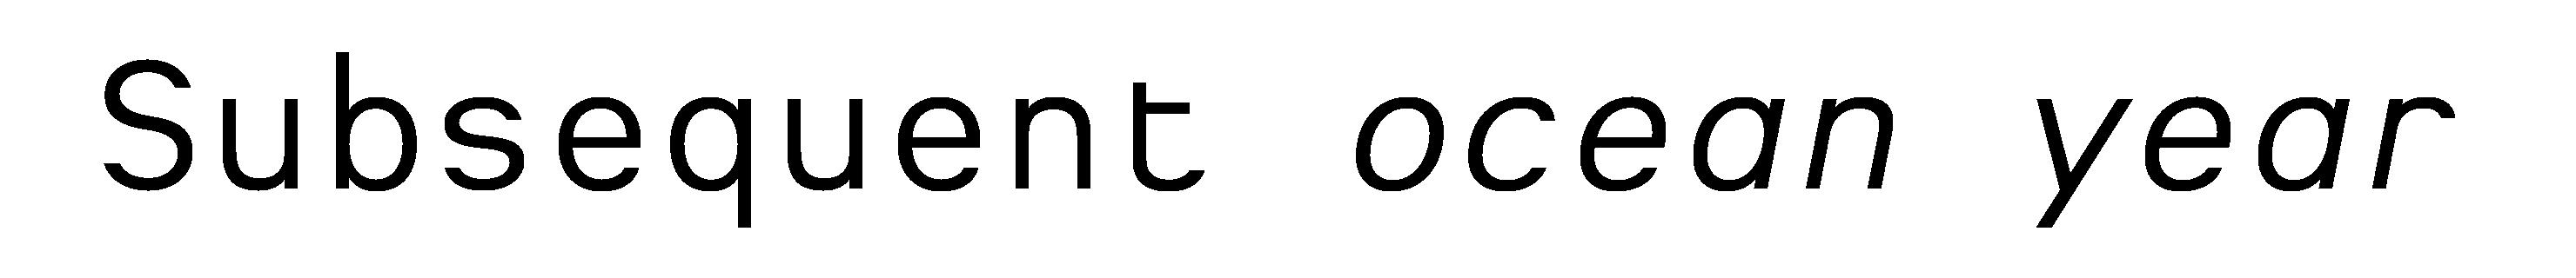 Typeface Heimat Mono D09 Atlas Font Foundry